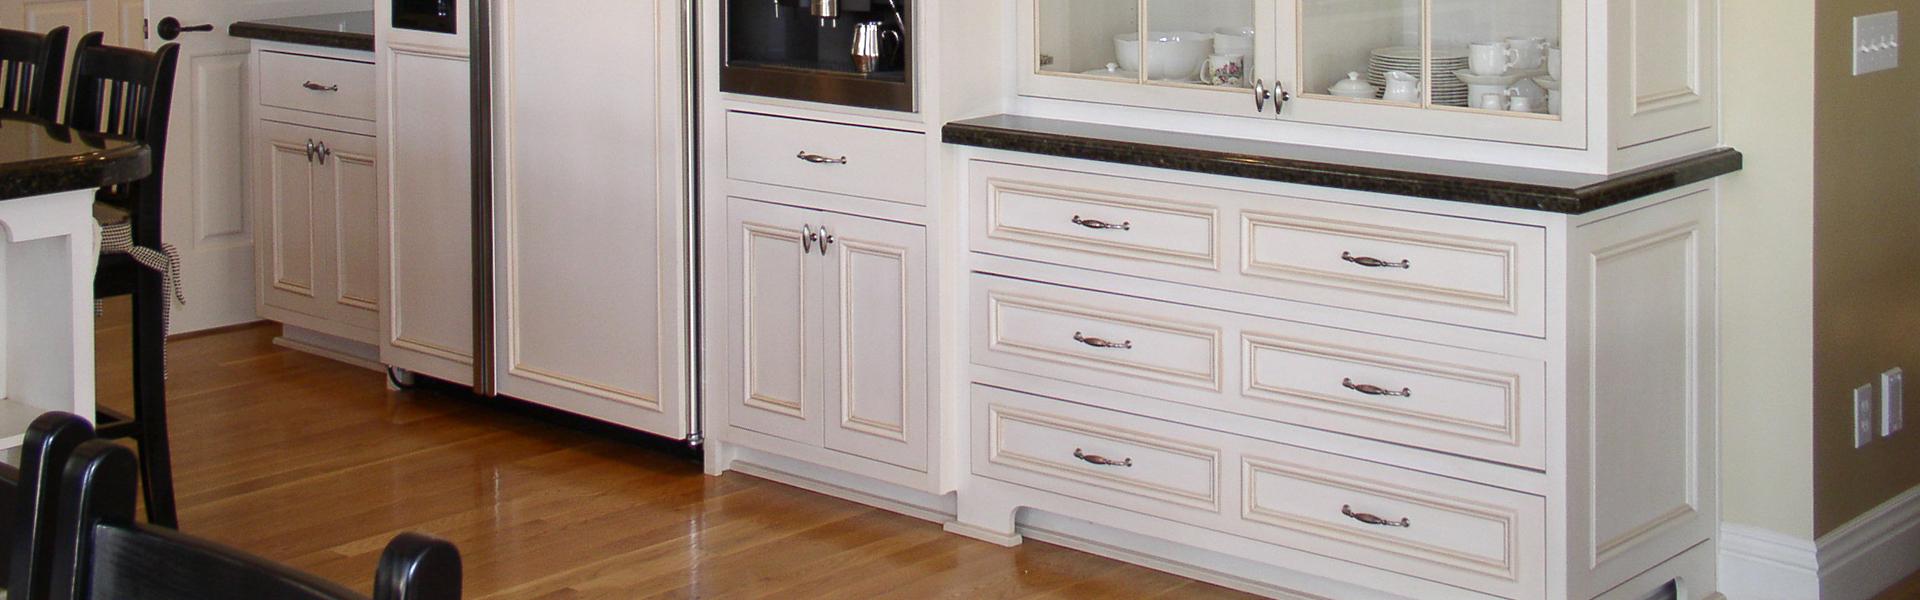 Flush Inset Cabinet Style